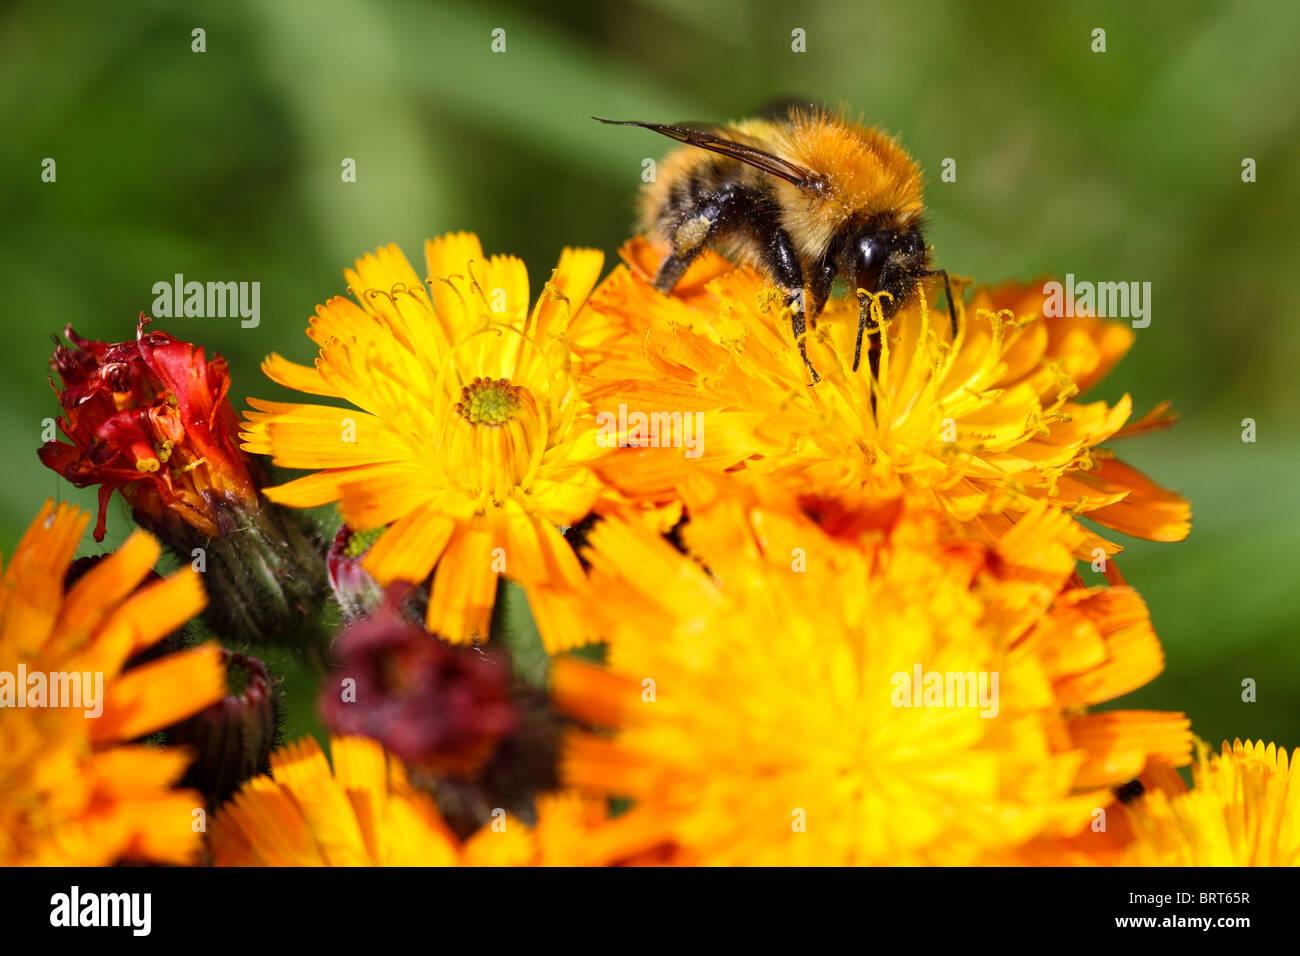 La abeja melífera recogiendo el néctar de las flores del jardín Montrose Scotland Foto de stock